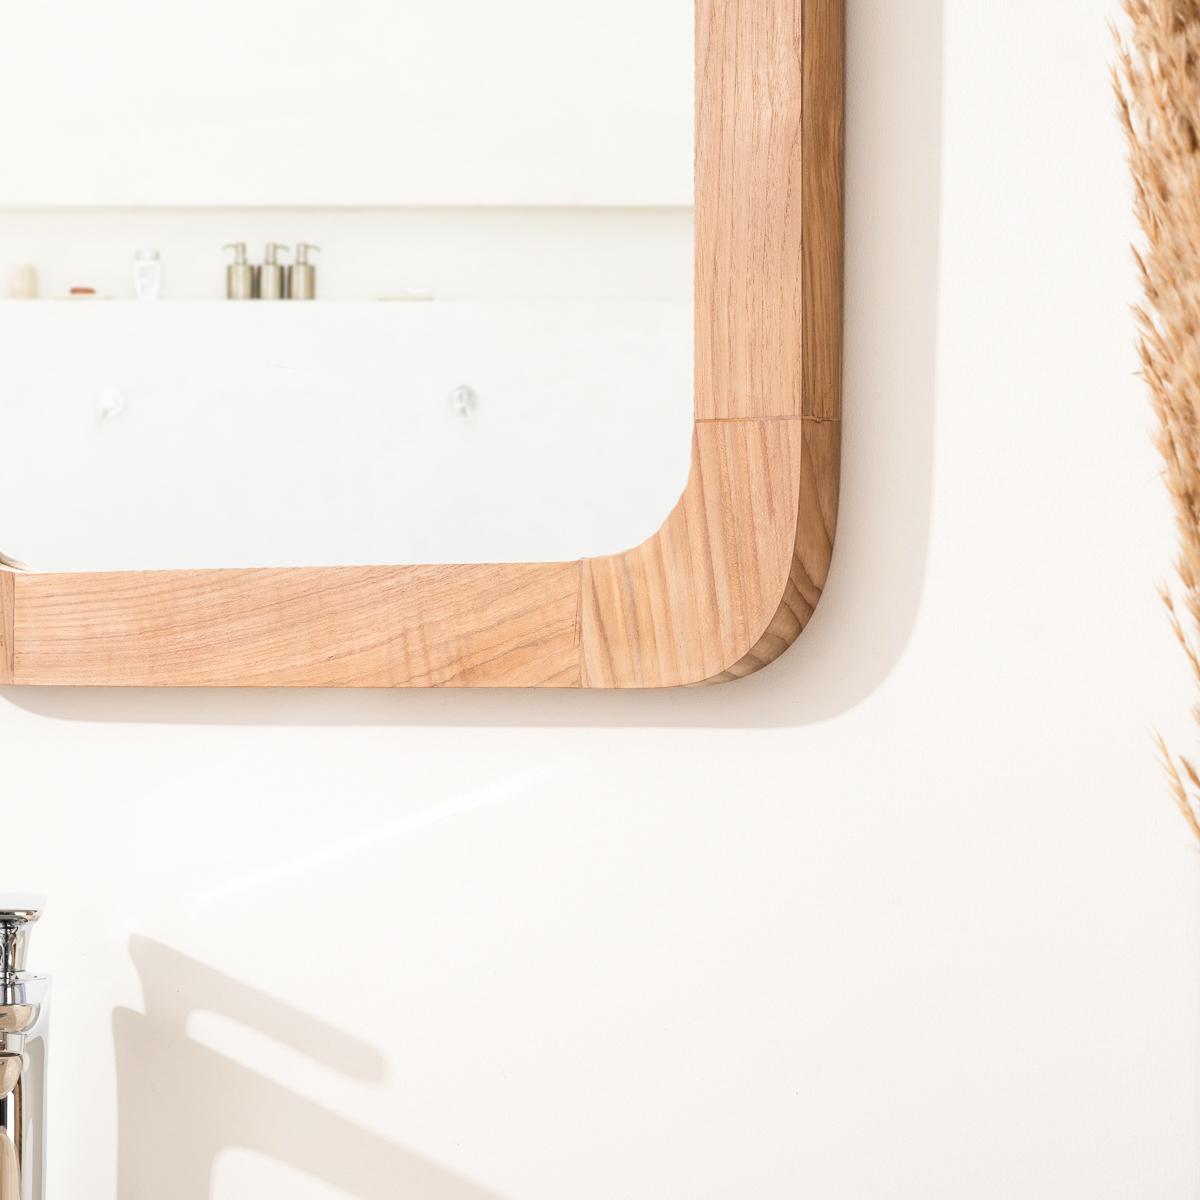 Neuf miroir r tro en teck massif 70 cm x 50cm for Miroir bois 50 x 70